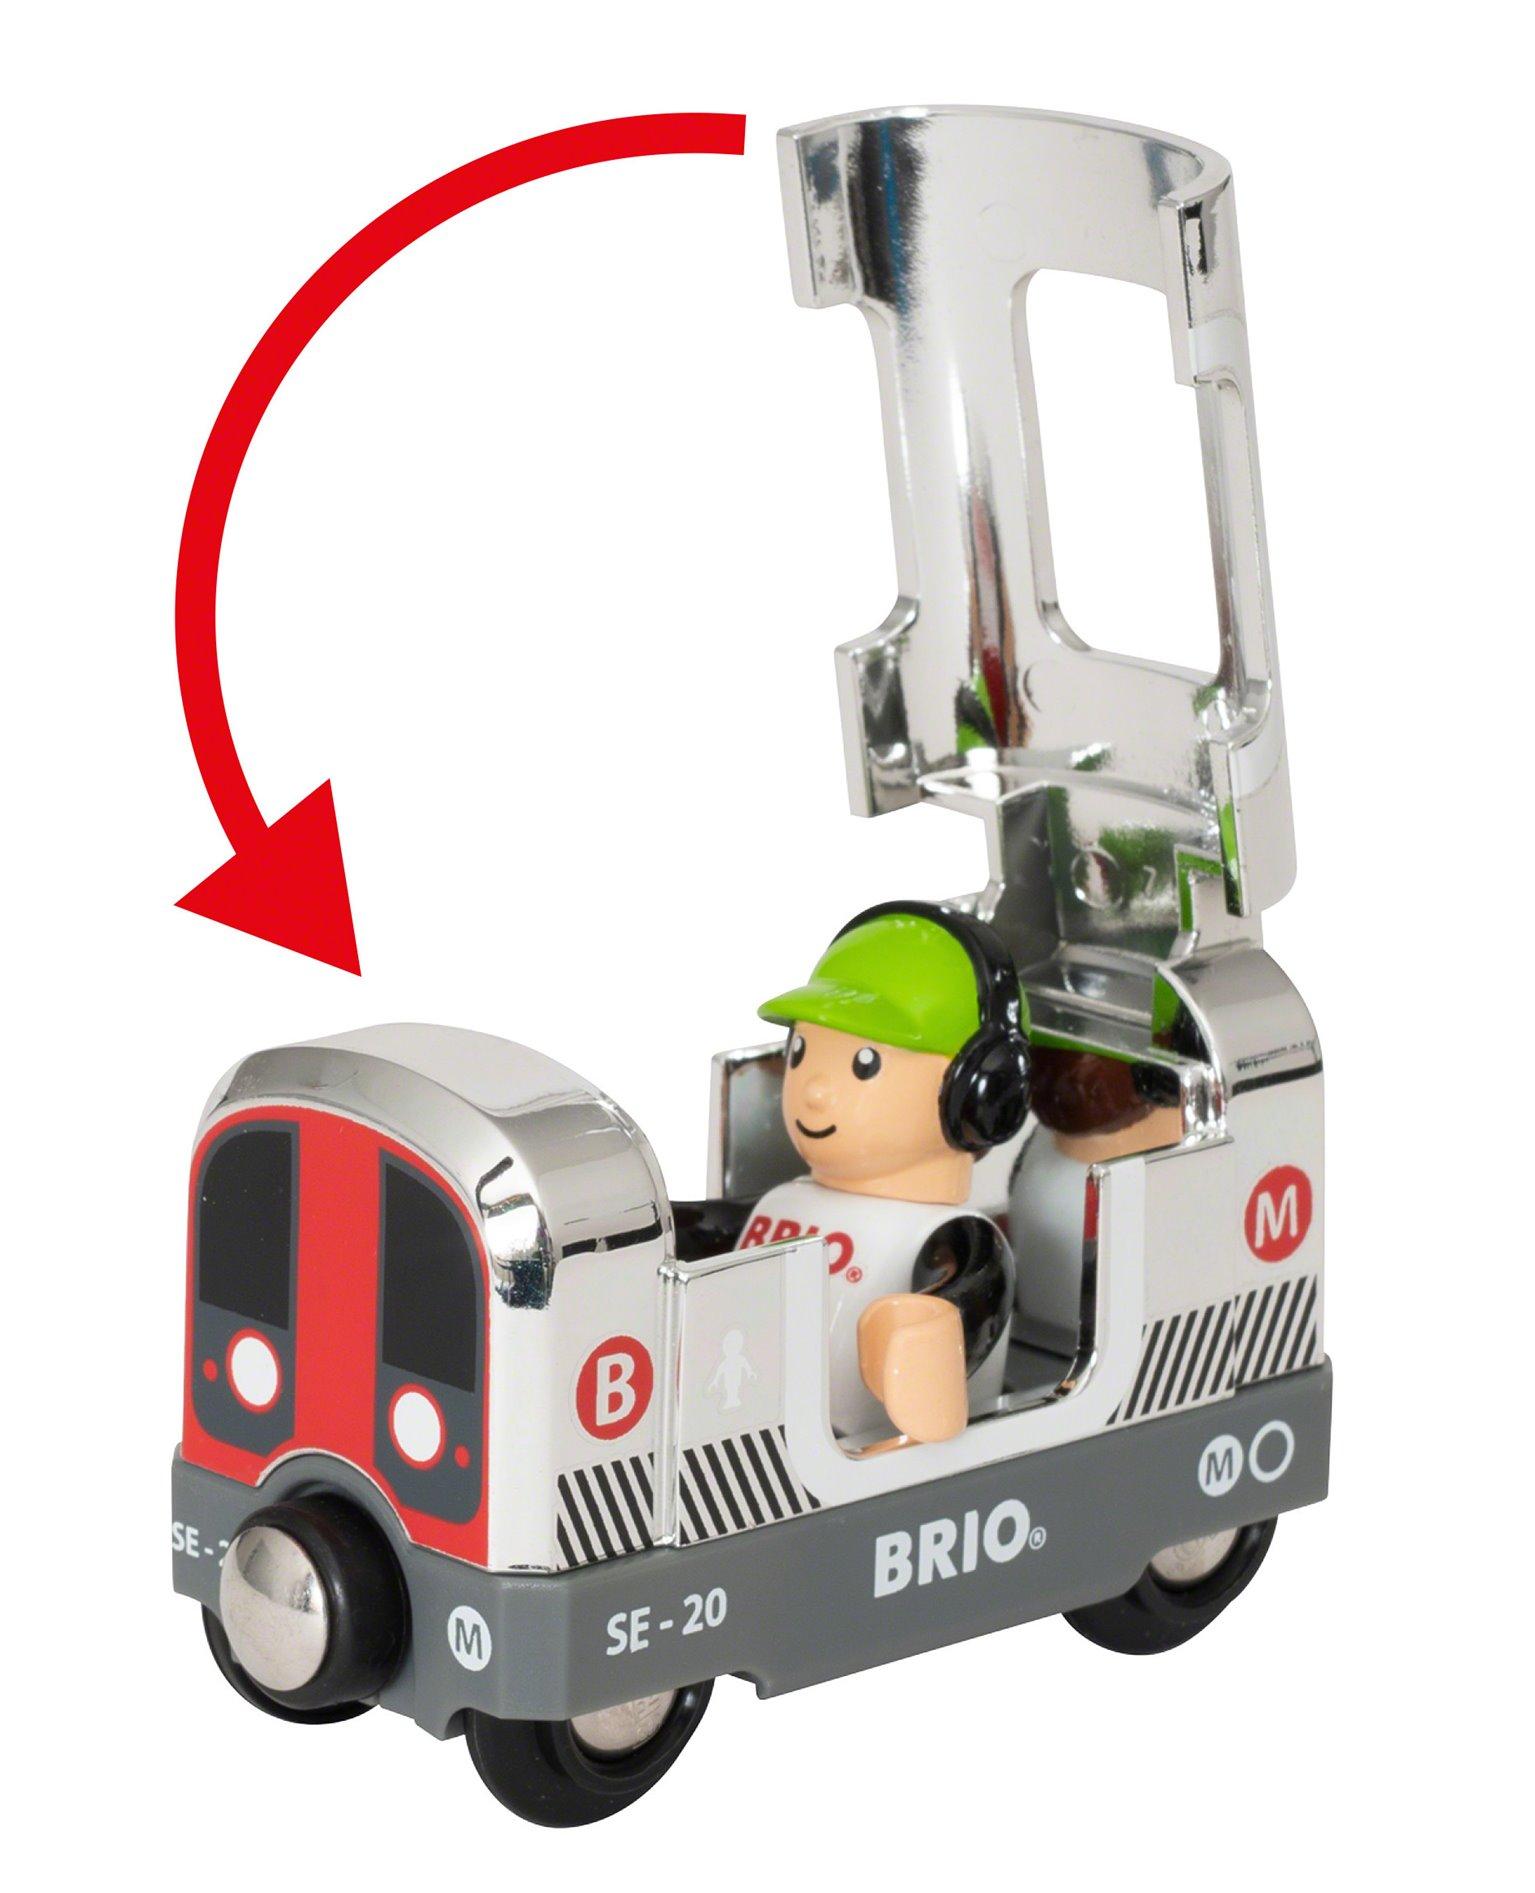 BRIO World - Special Edition 2020 Silver Metro Train